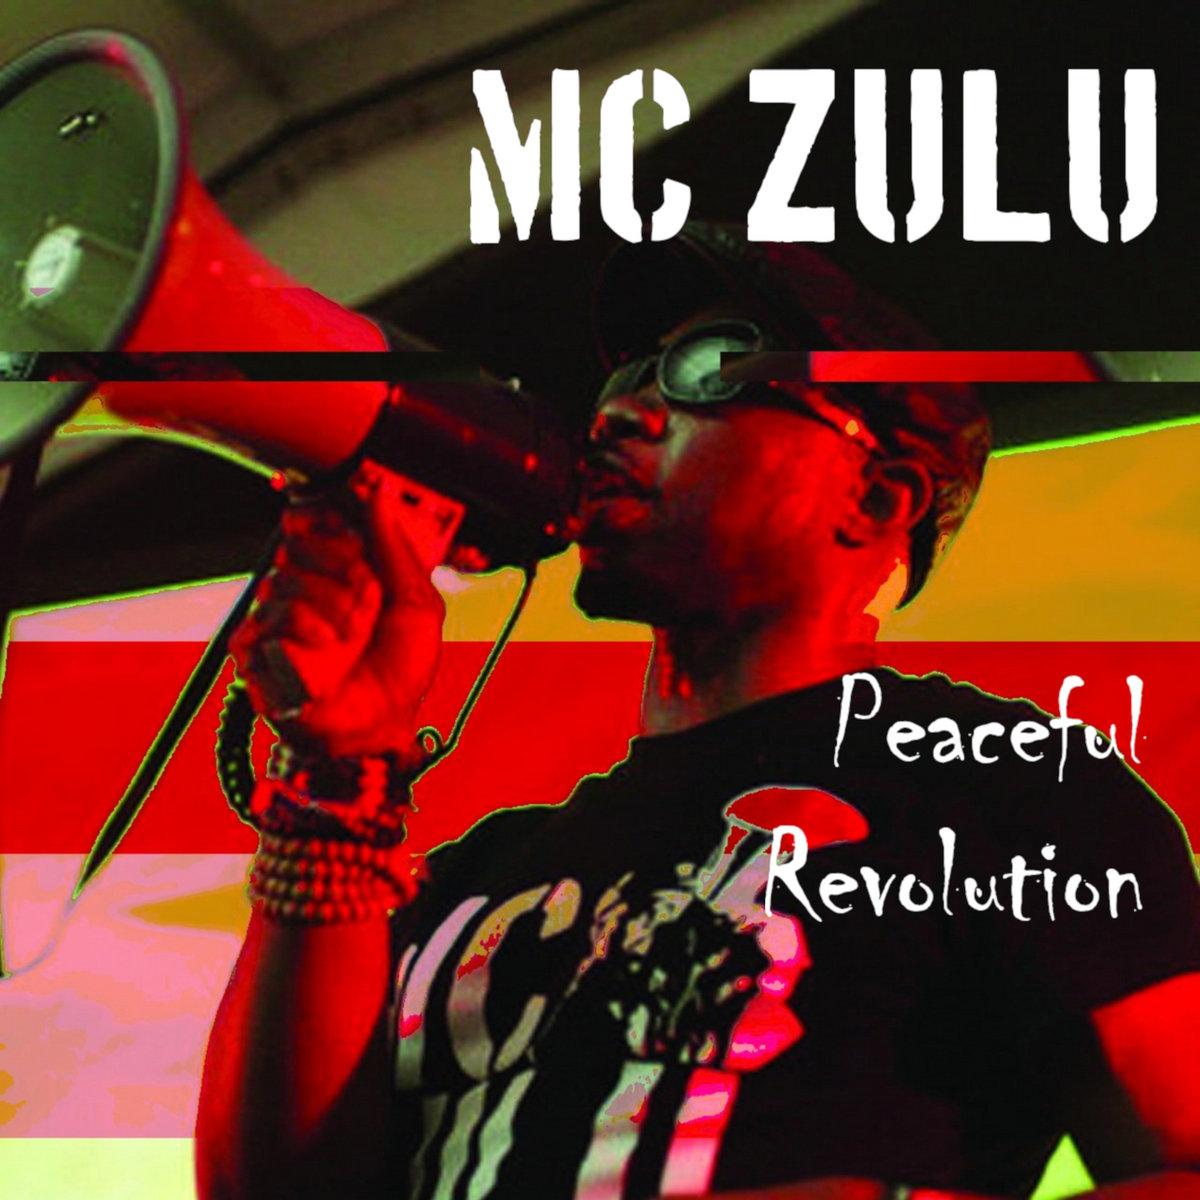 MC ZULU – Peaceful Revolution